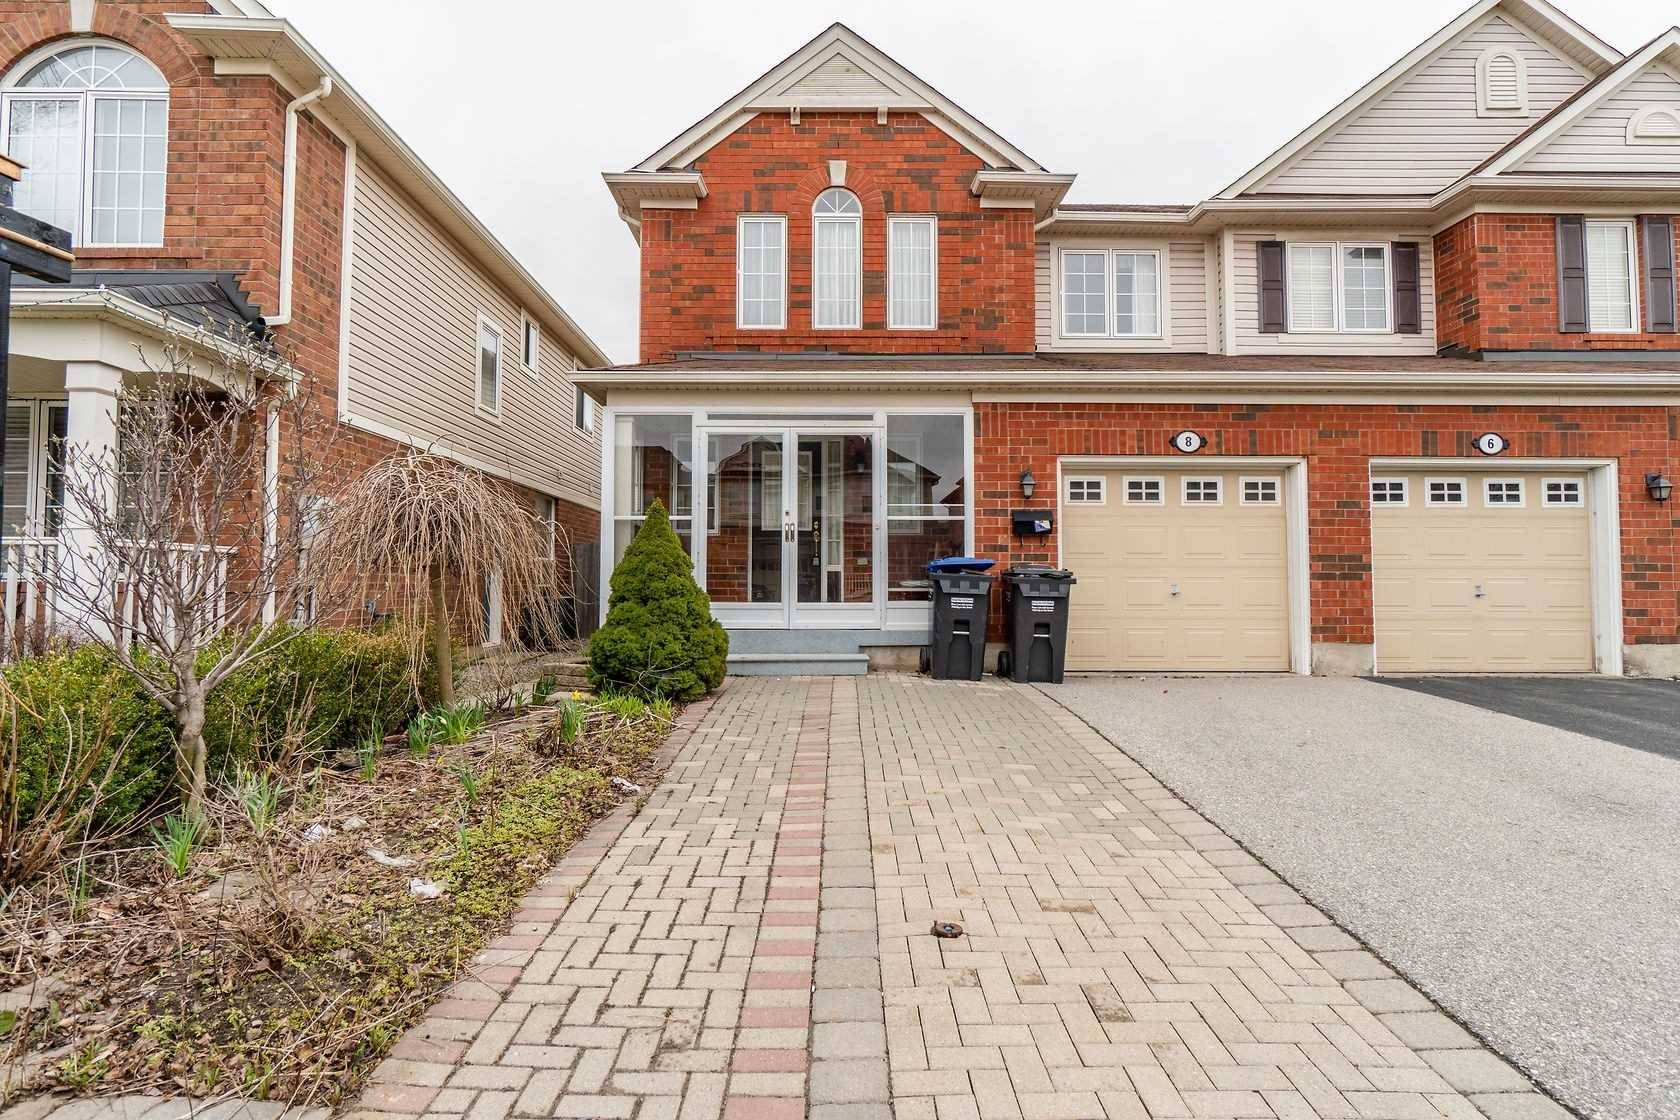 Townhouse for sale at 8 Tawnie Cres Brampton Ontario - MLS: W4398615